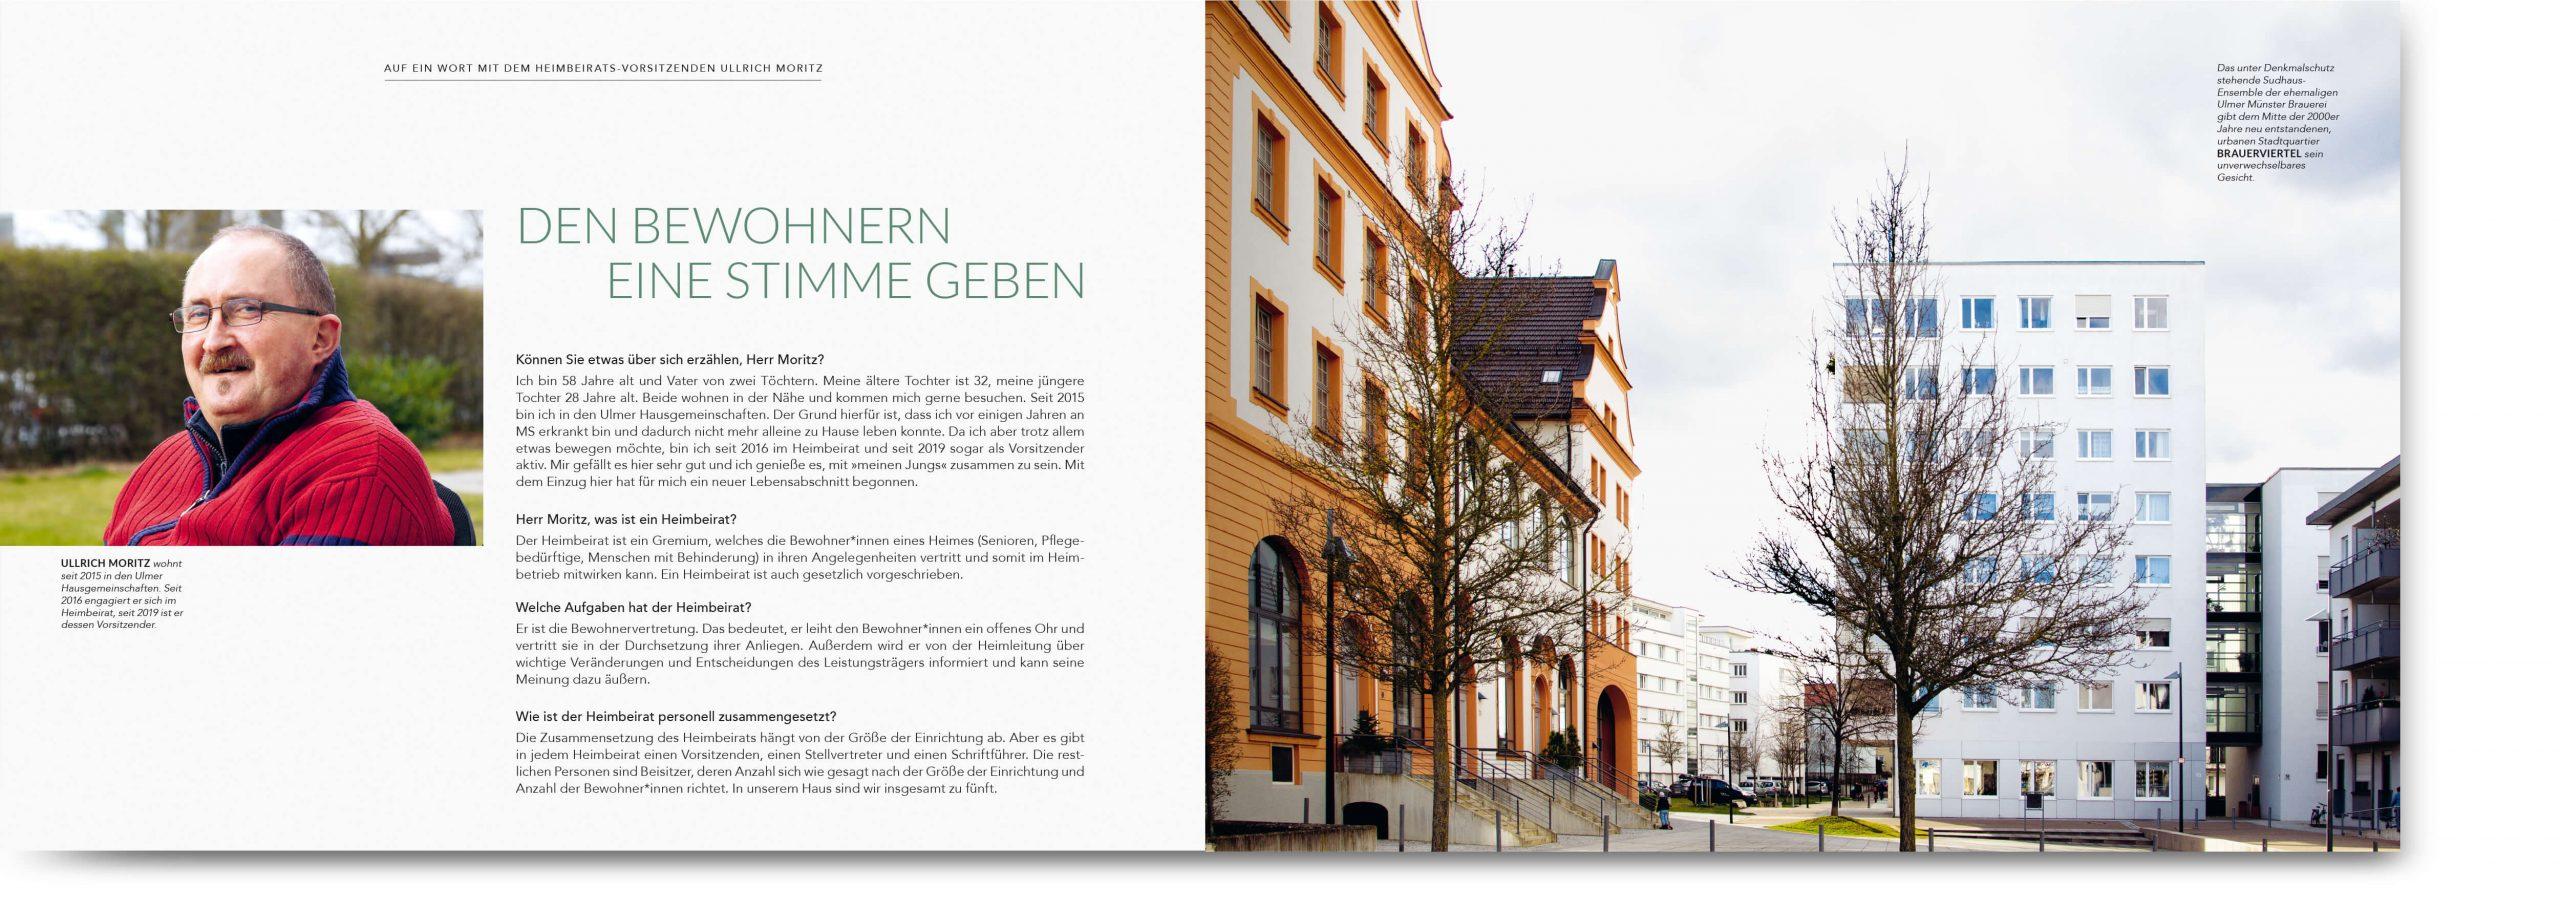 fh-web-asb-broschüren-ulm-6-scaled.jpg